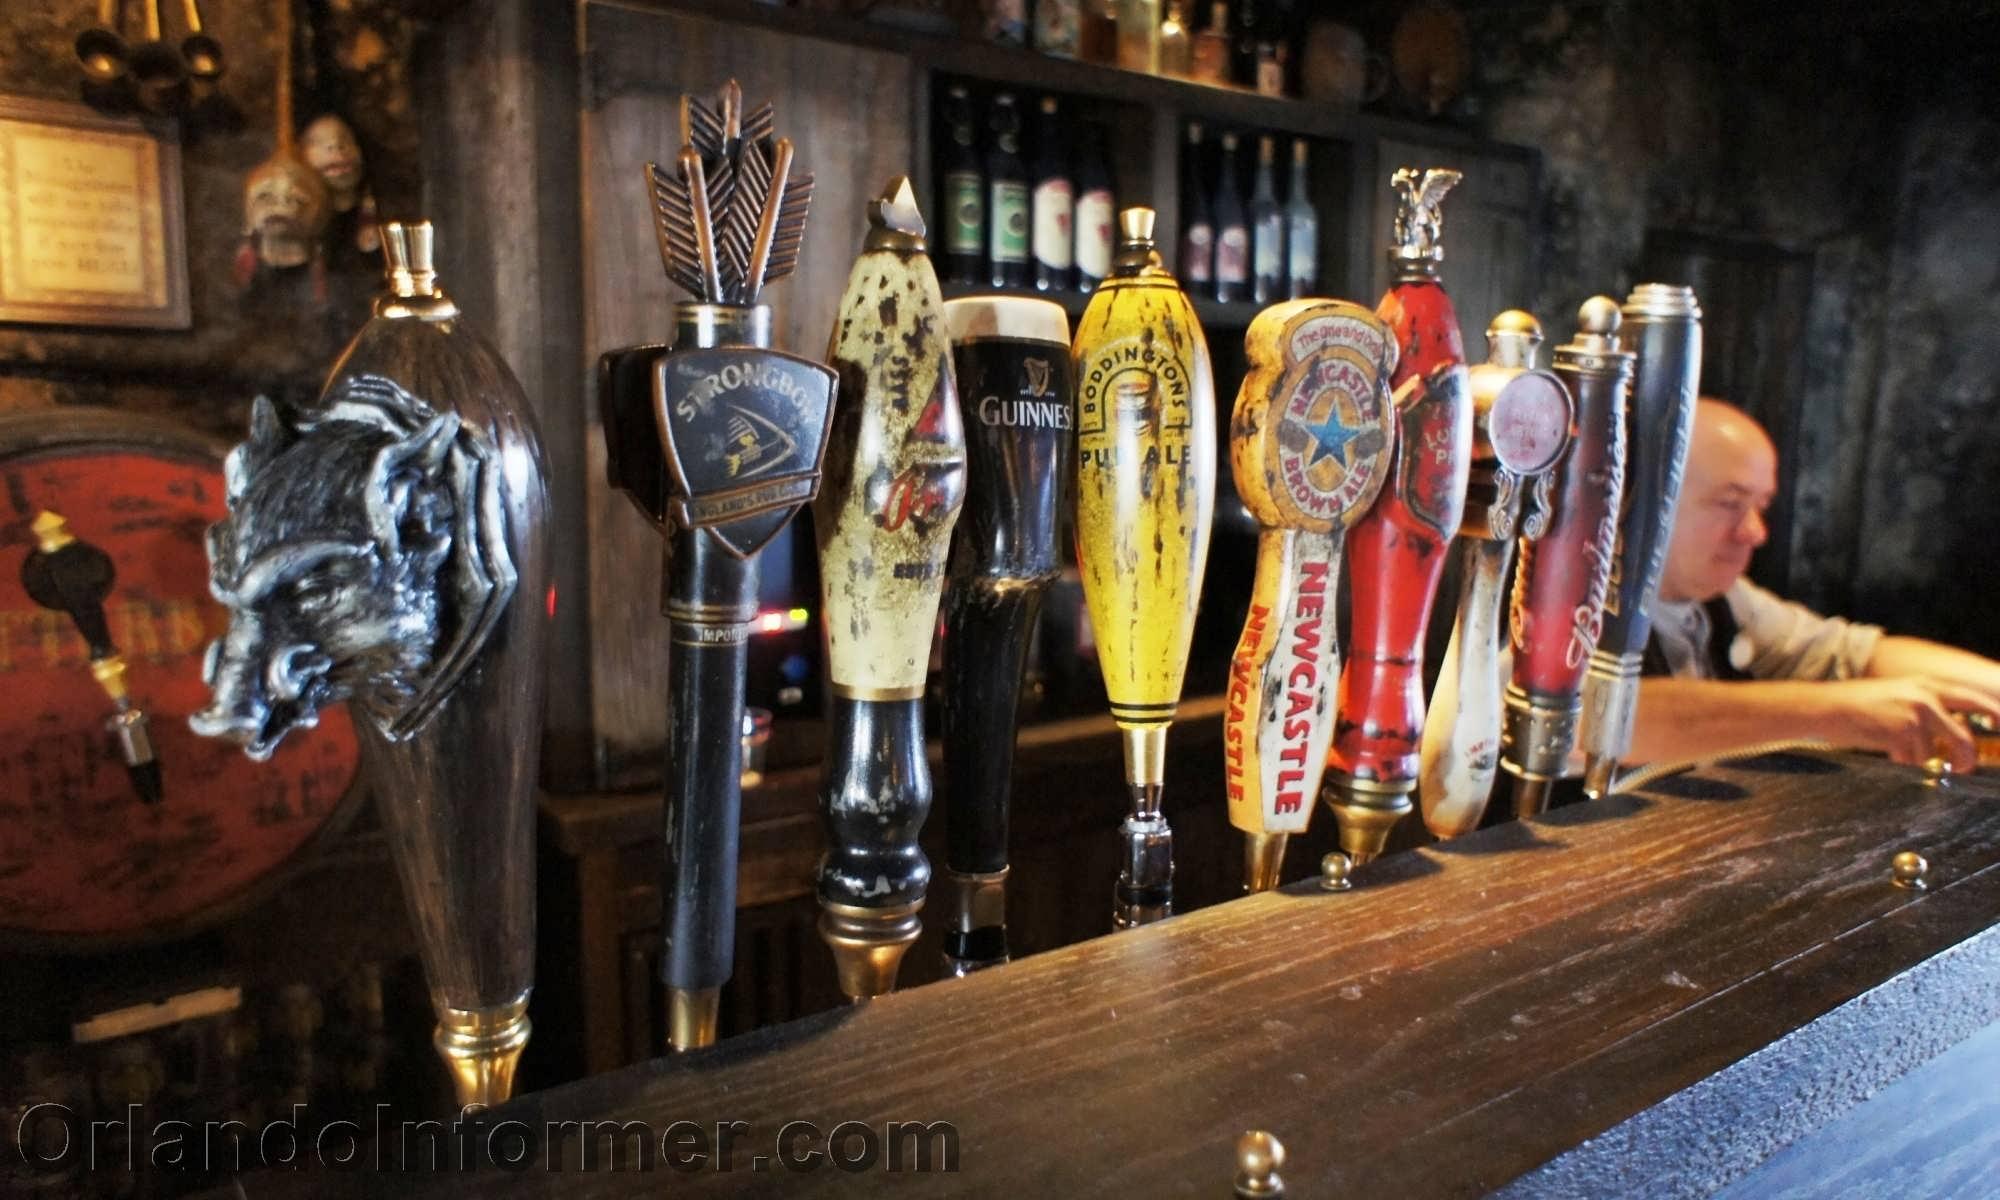 Hog's Head: The brews on tap.